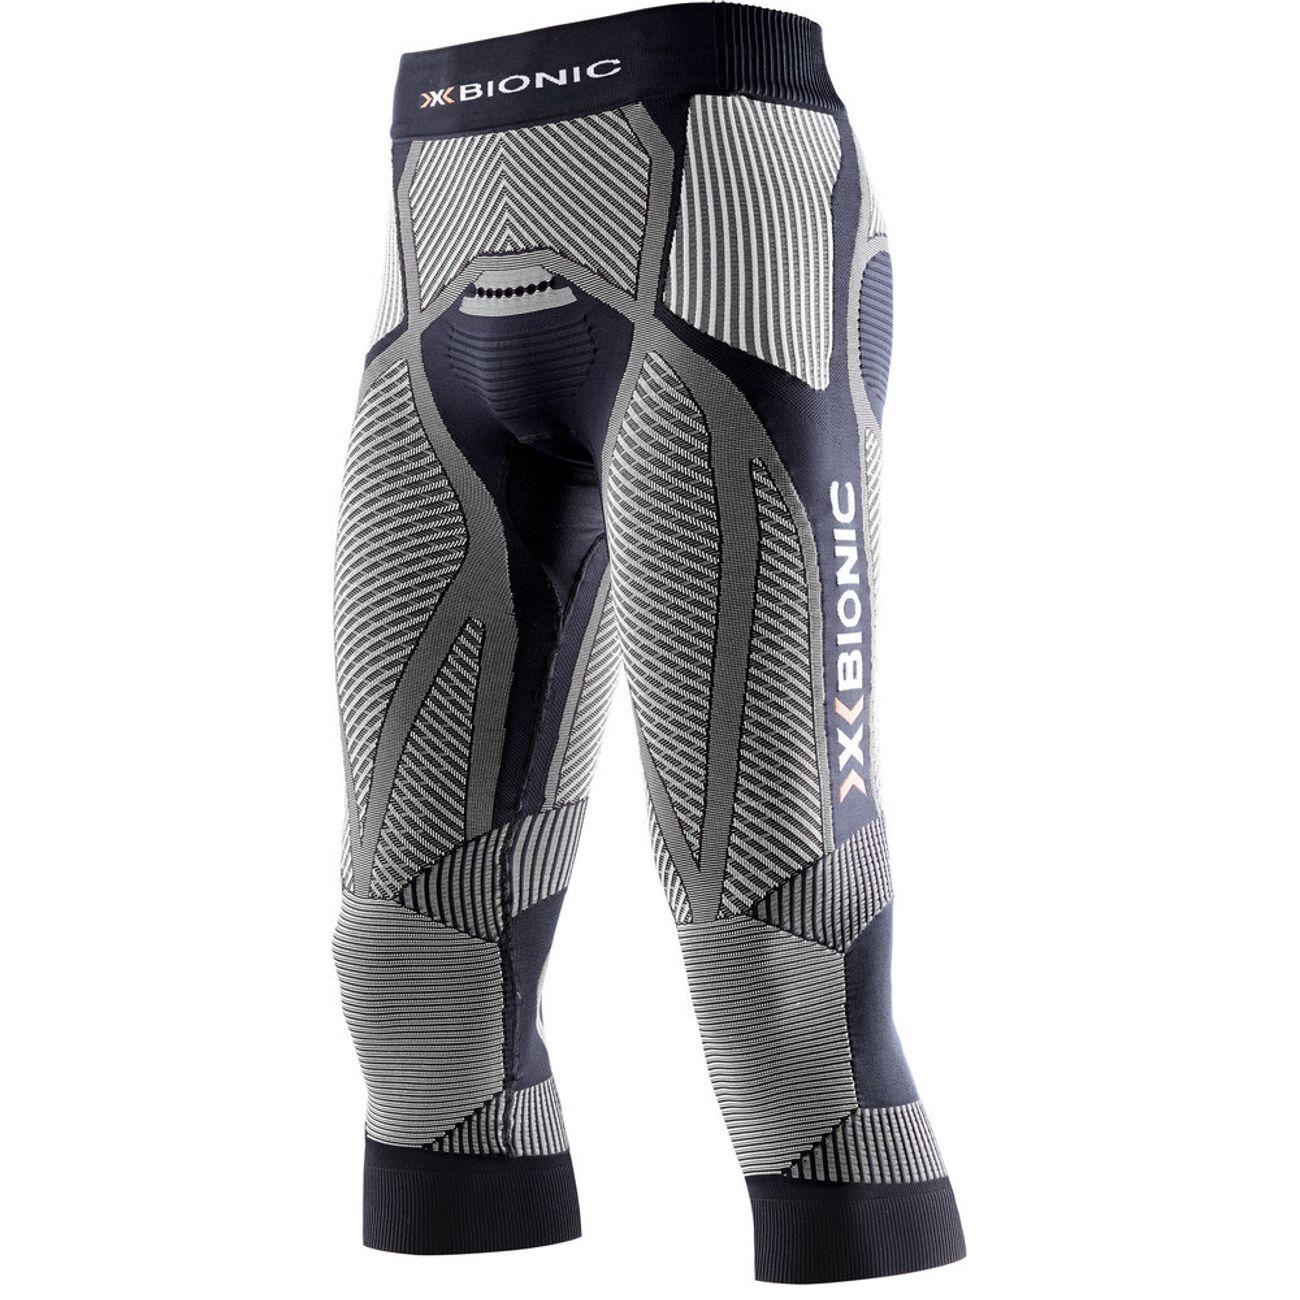 ramasser f0bd6 708c2 Course à pied homme X-BIONIC X-Bionic Men Le pantalon de course à pied  Trick Running Short - O100247-B119